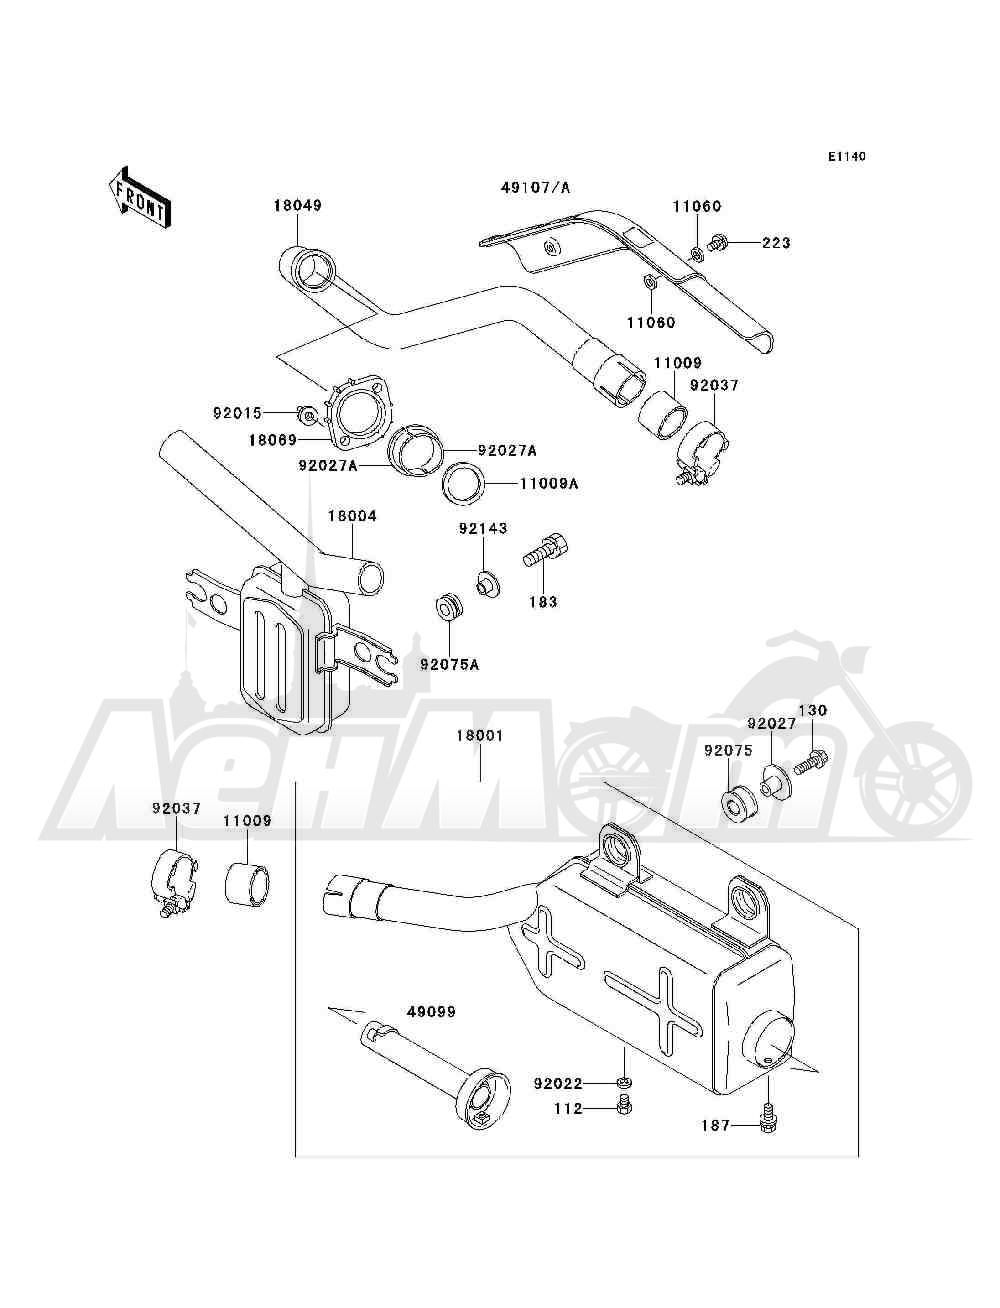 Запчасти для Квадроцикла Kawasaki 1993 BAYOU 300 4X4 (KLF300-C5) Раздел: MUFFLER(S) | глушитель (S)